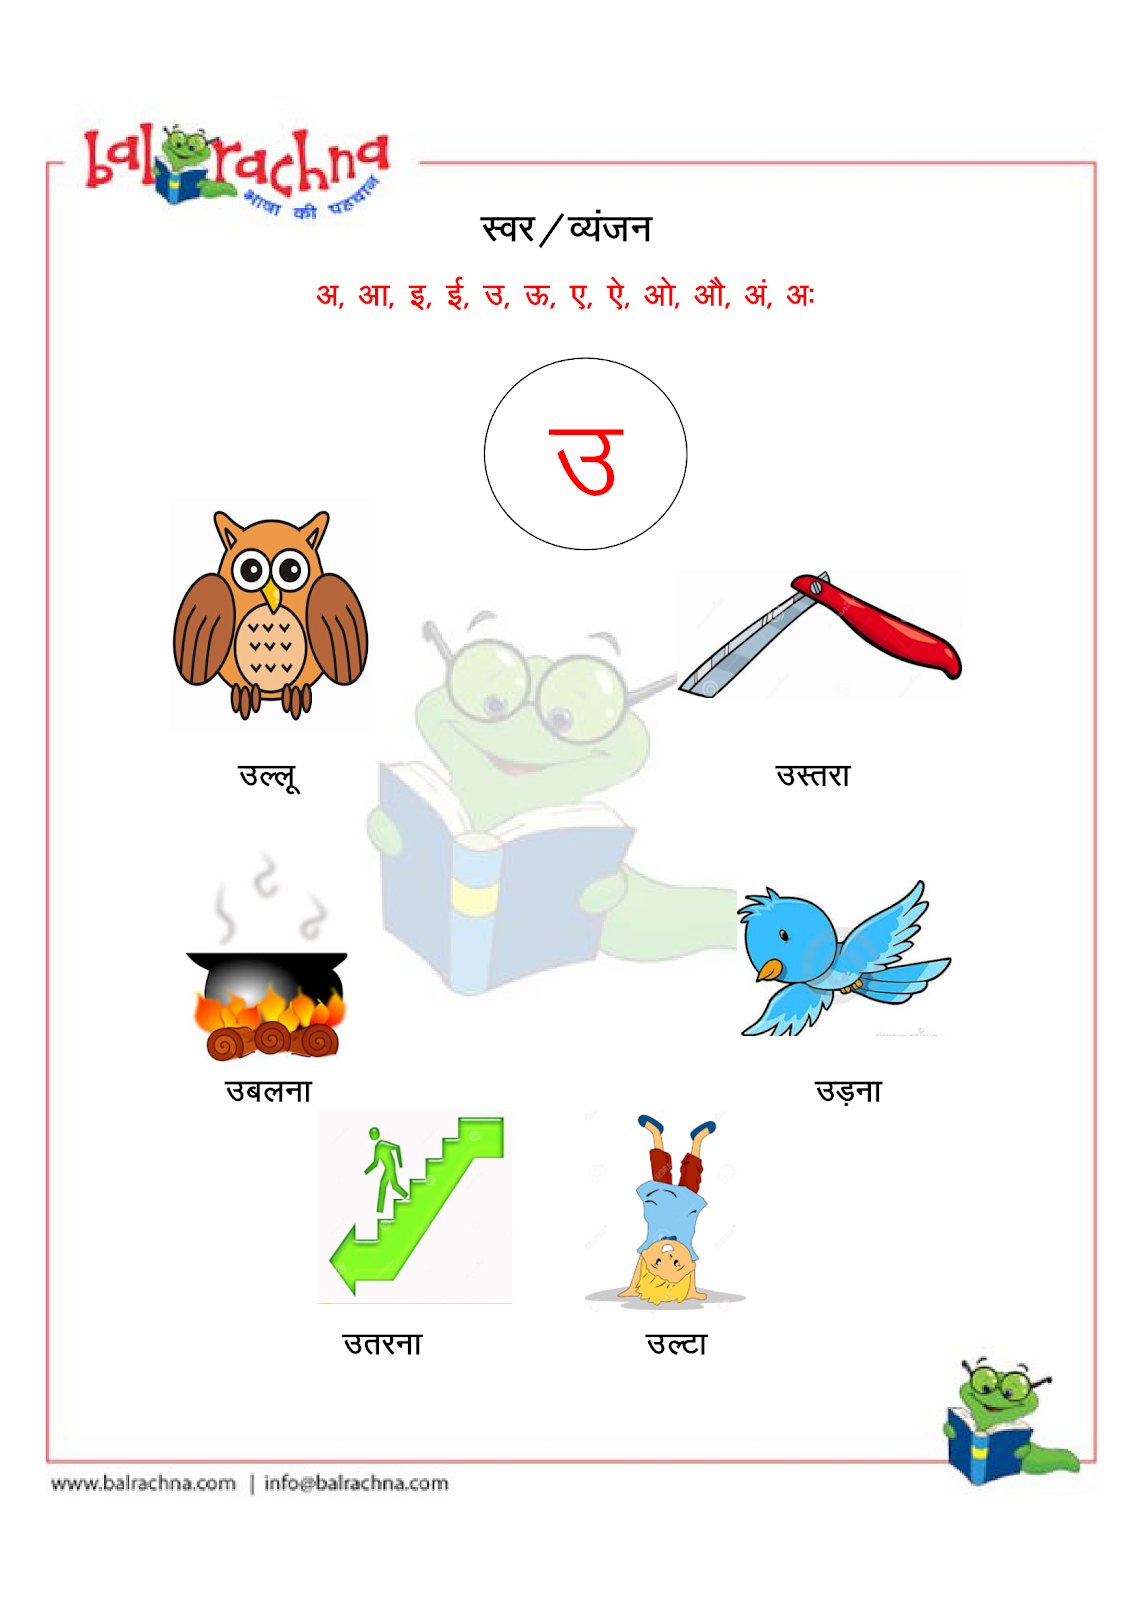 Balrachna Varnamala Swar Vyanjan 1 Swar Daily Schedules Daily Schedules Toddler Activ Hindi Alphabet Alphabet Worksheets Preschool Alphabet Kindergarten [ 1600 x 1131 Pixel ]